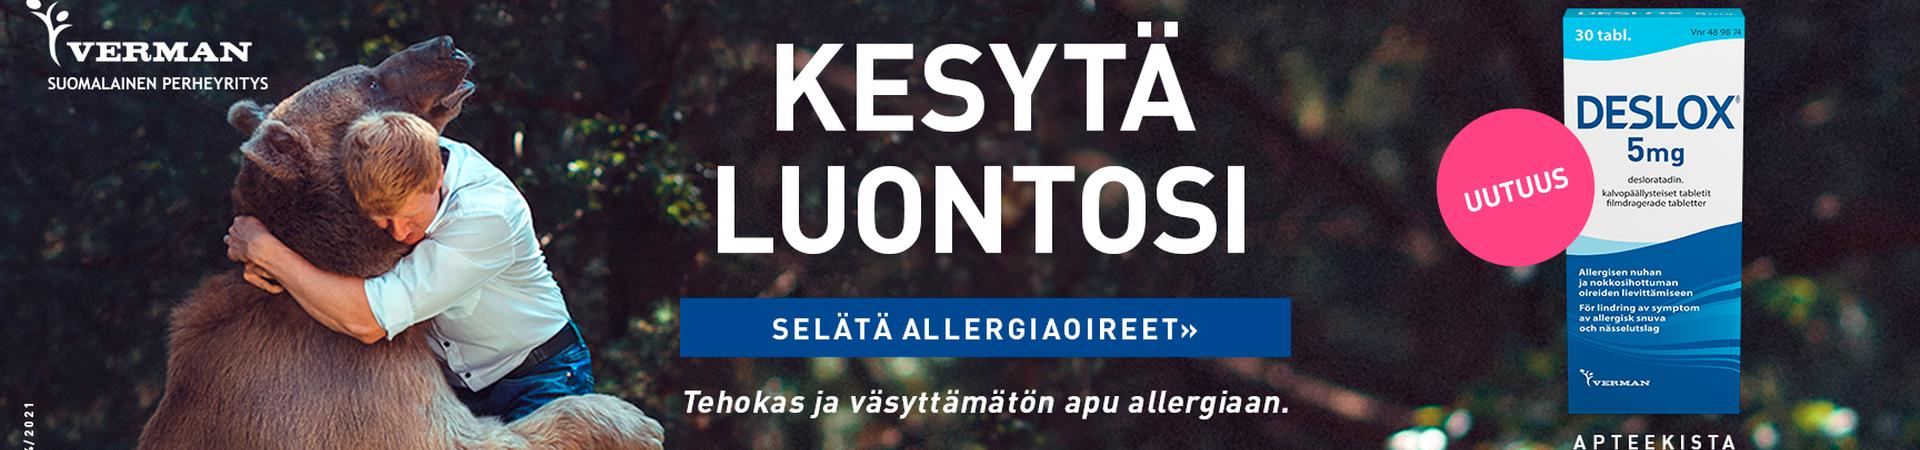 deslox allergialääke